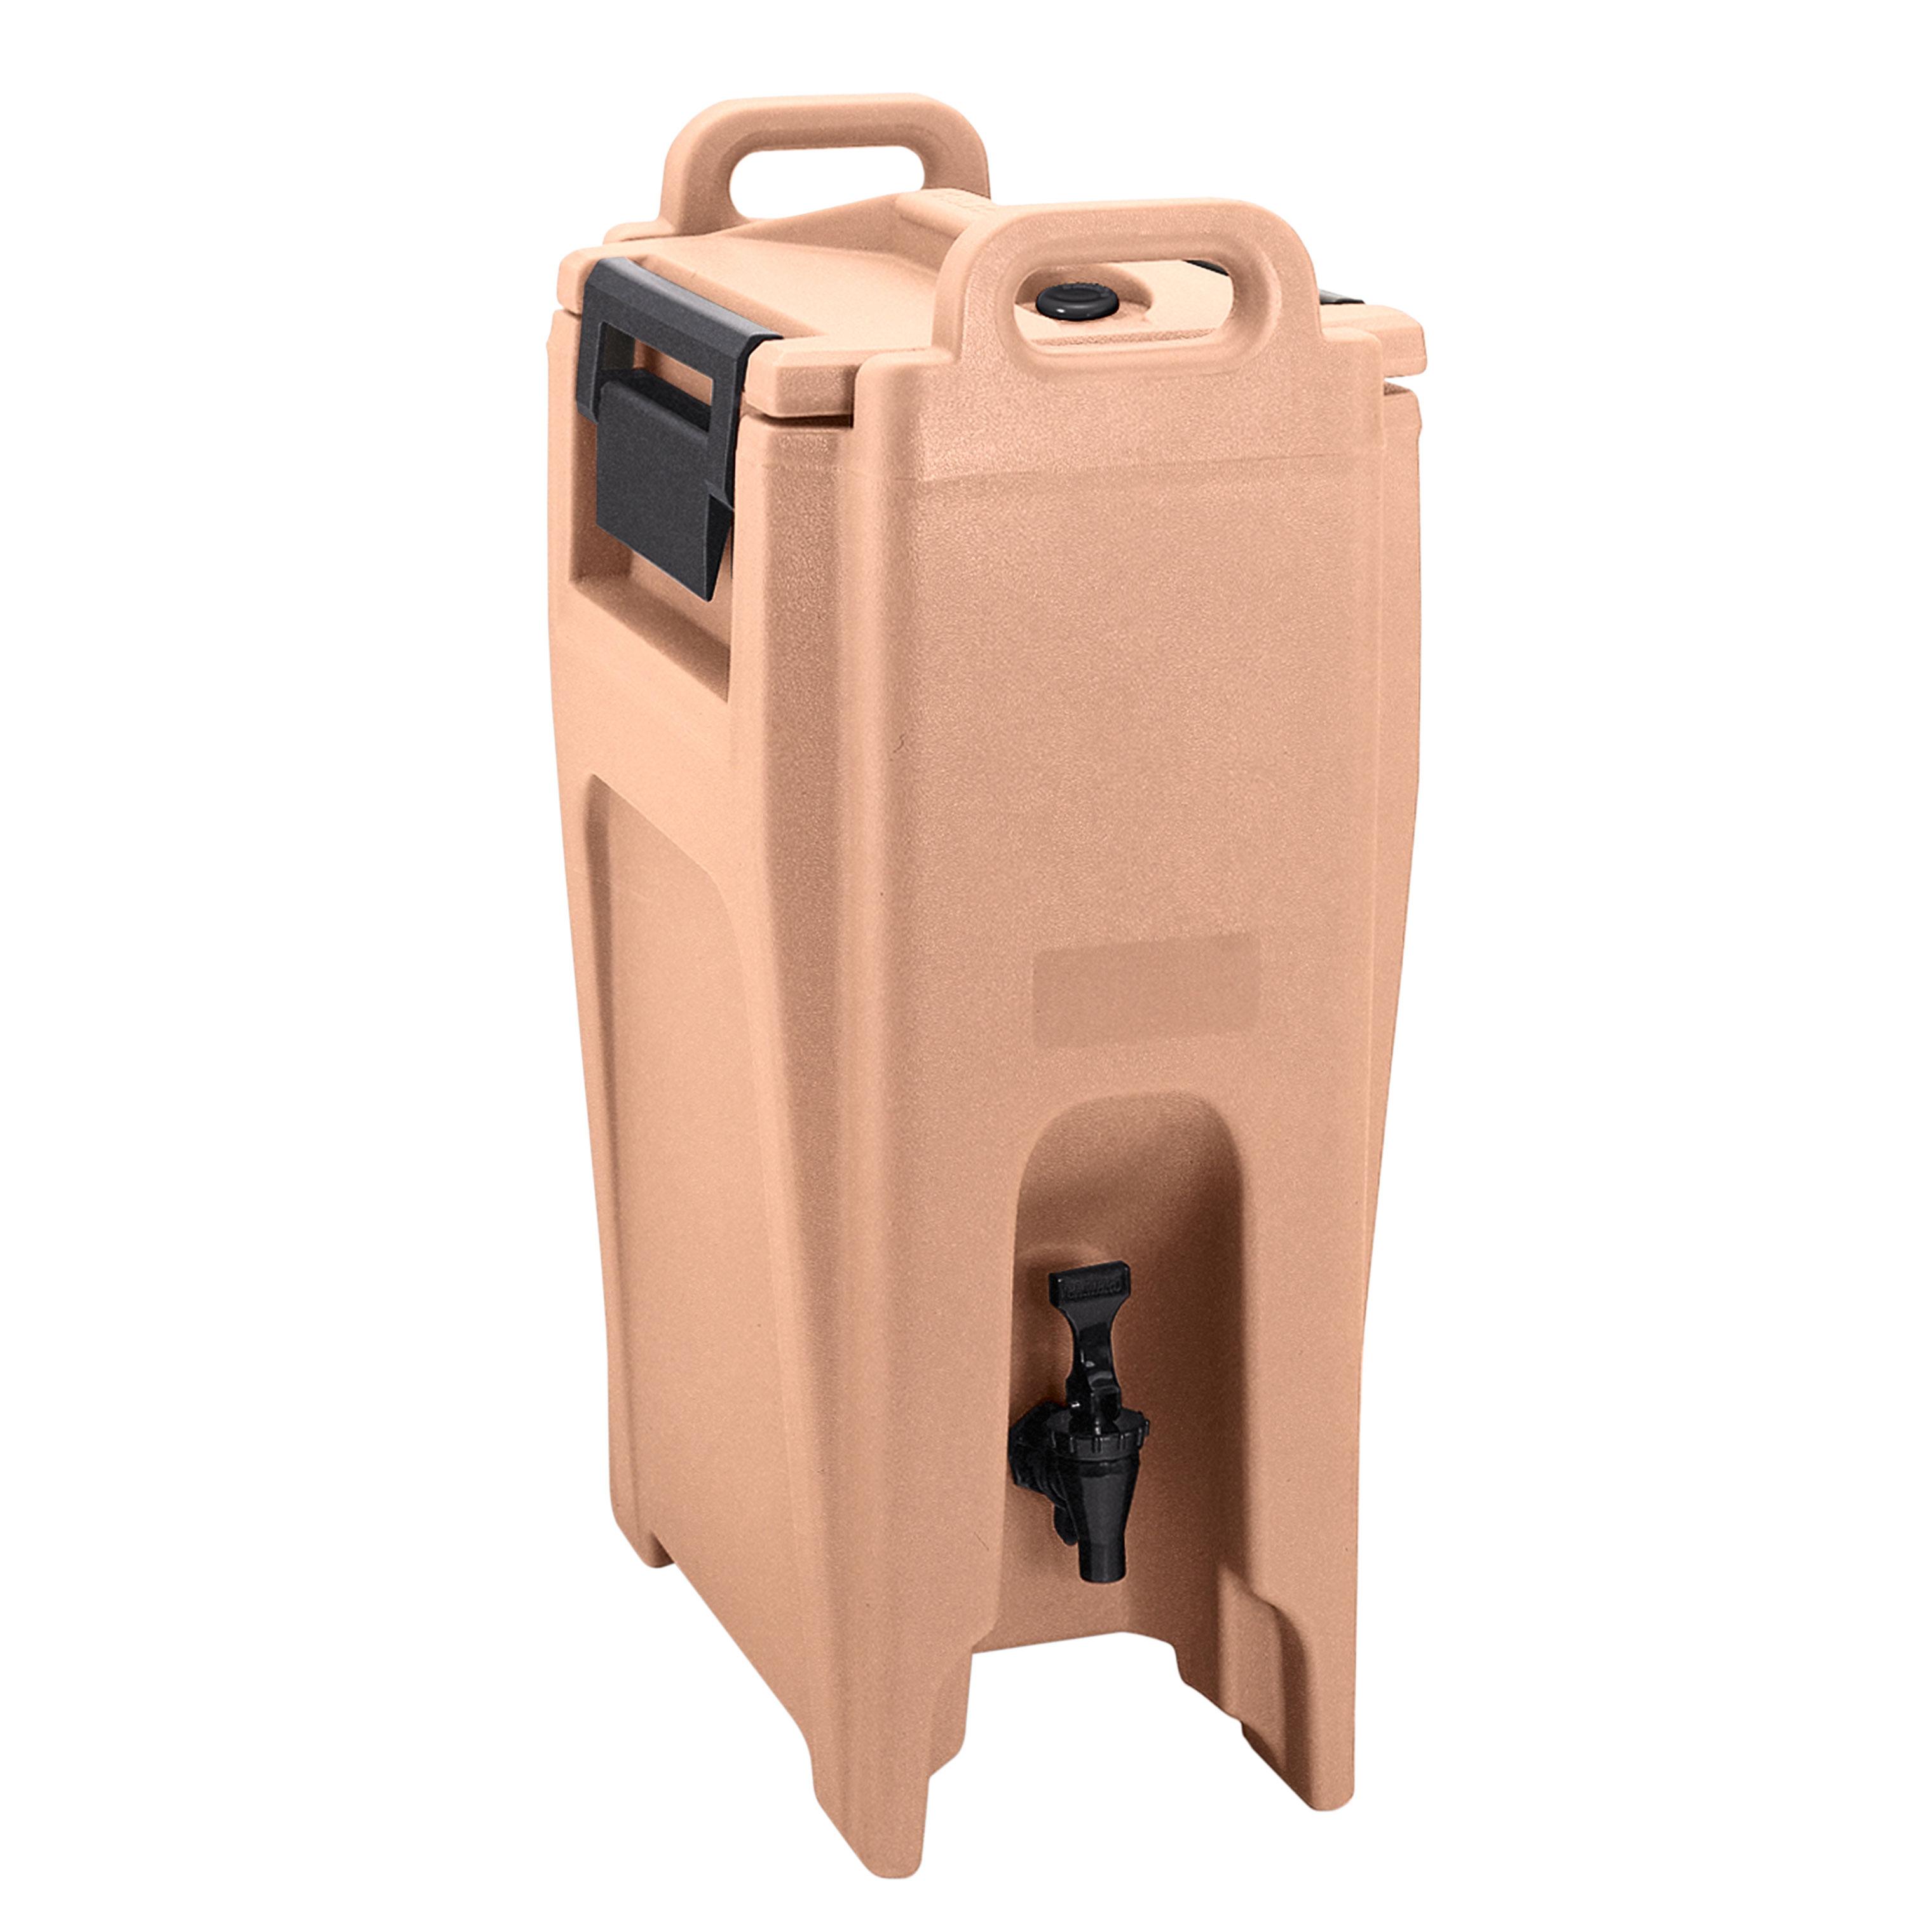 Cambro UC500157 beverage dispensers